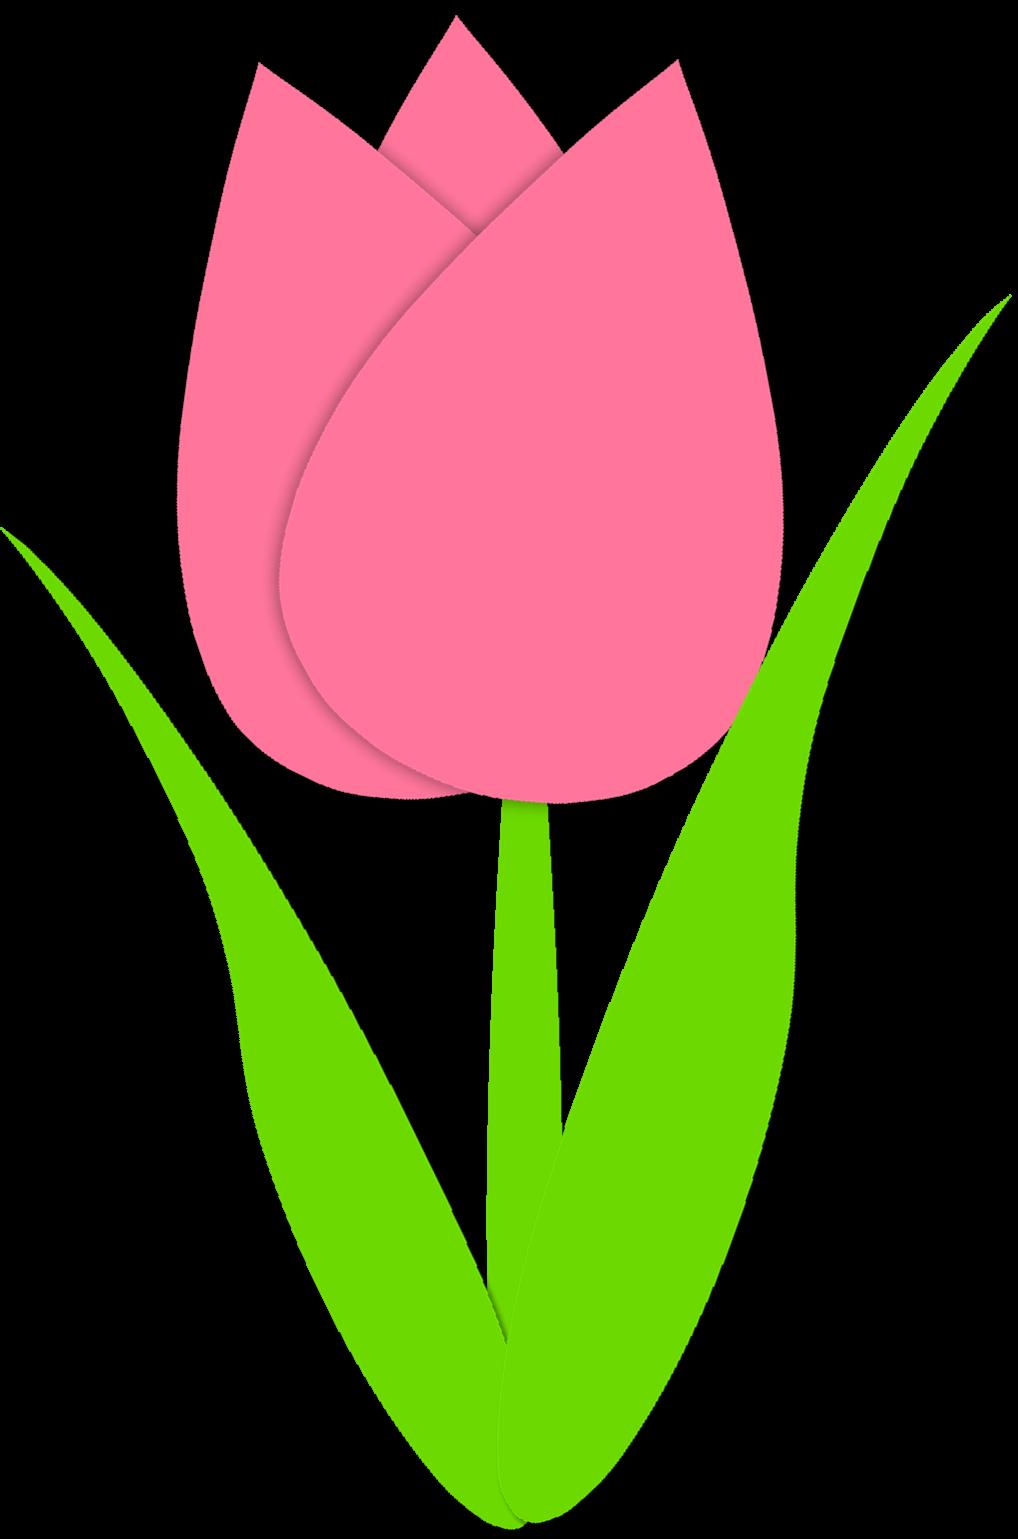 Simple Tulip Outline Simple tulip outline.